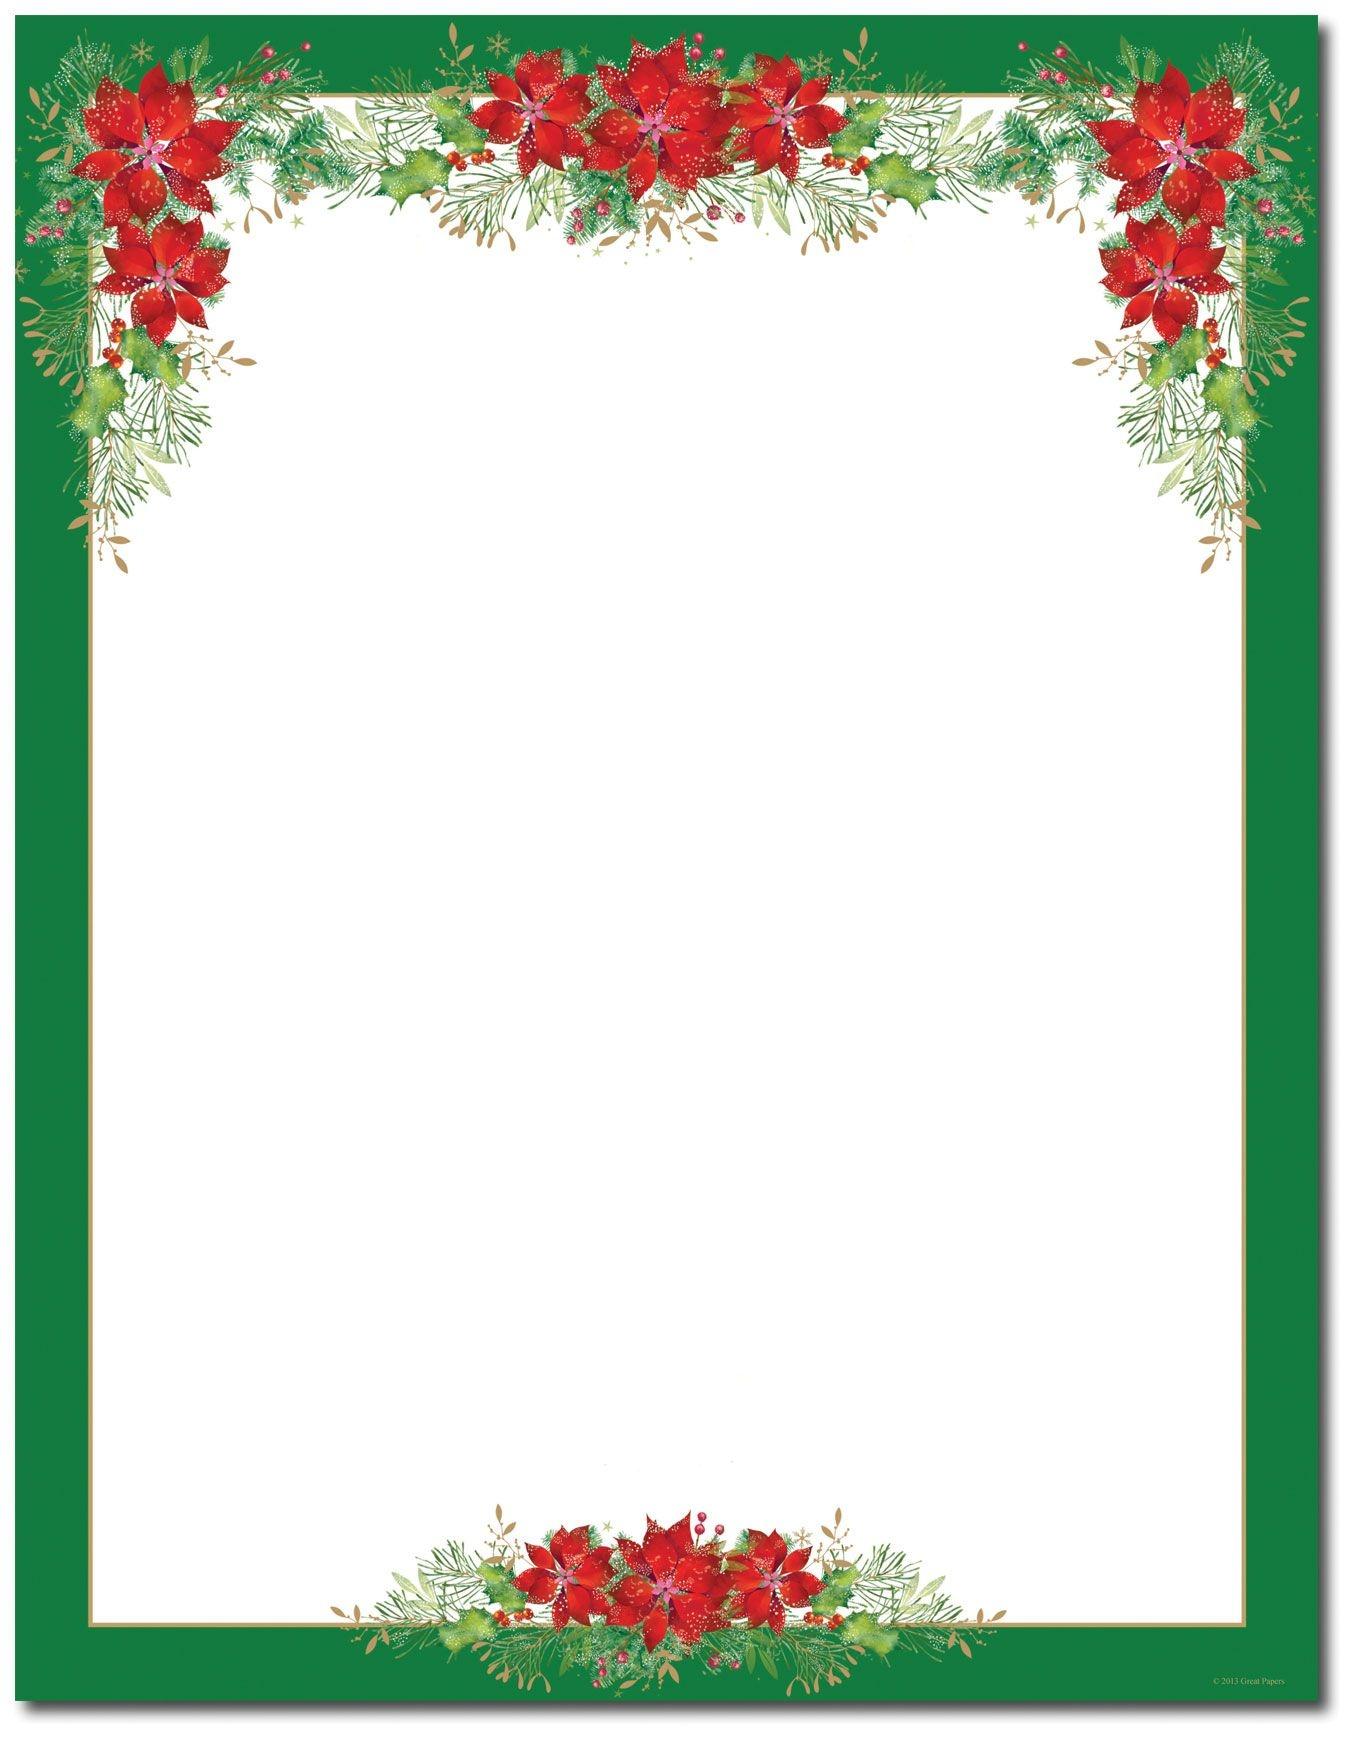 Poinsettia Valance Letterhead | Holiday Papers | Christmas Border - Free Printable Christmas Border Paper